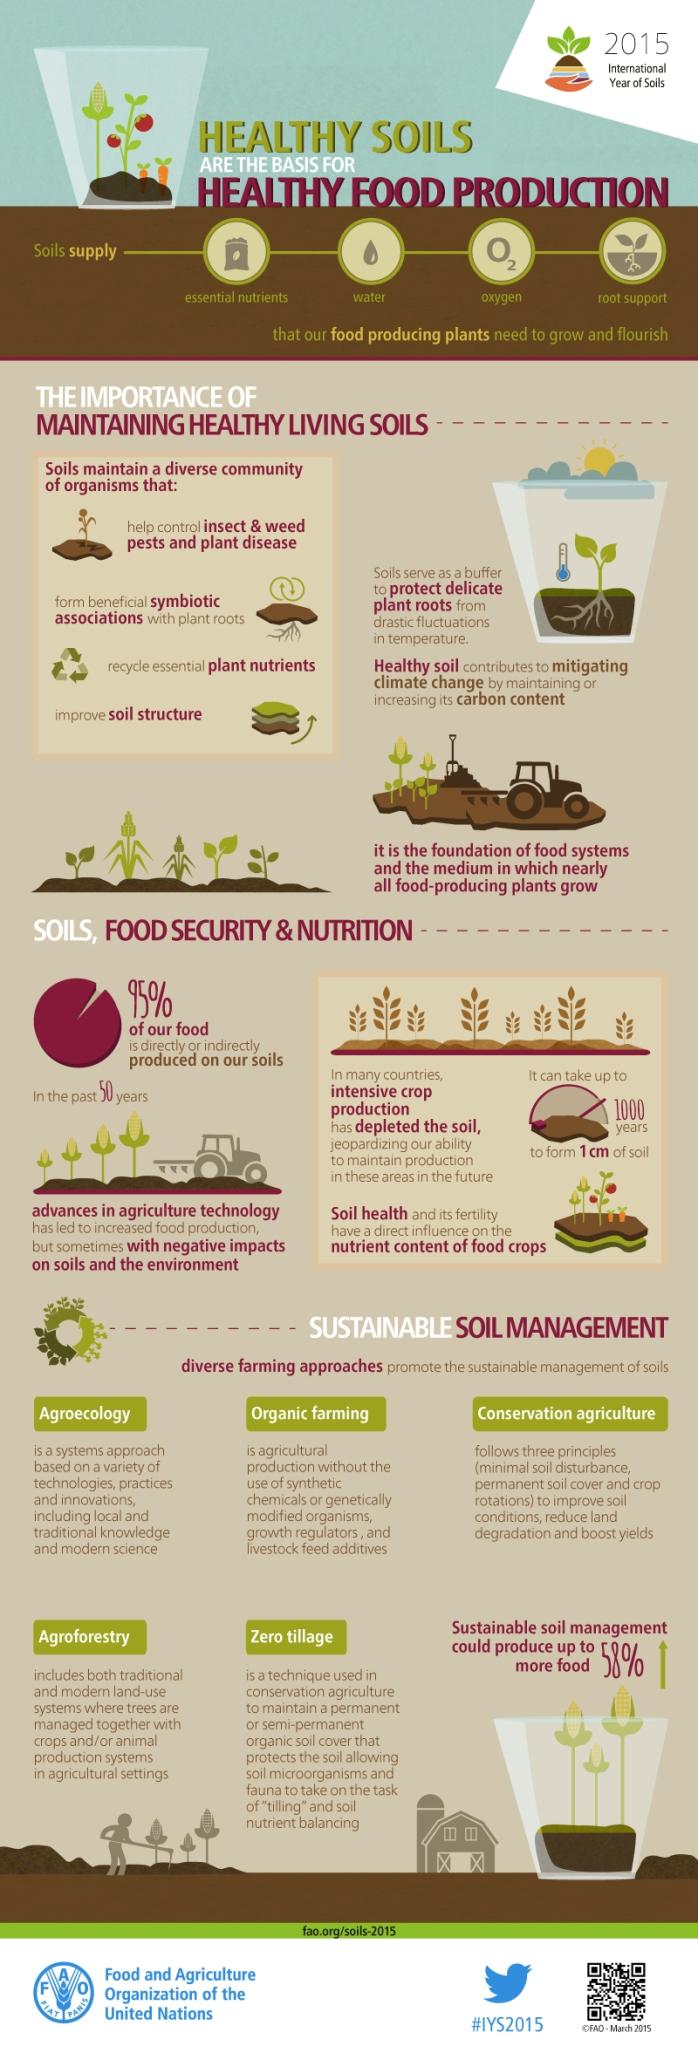 FAO-Infographic-IYS2015-fs2-en